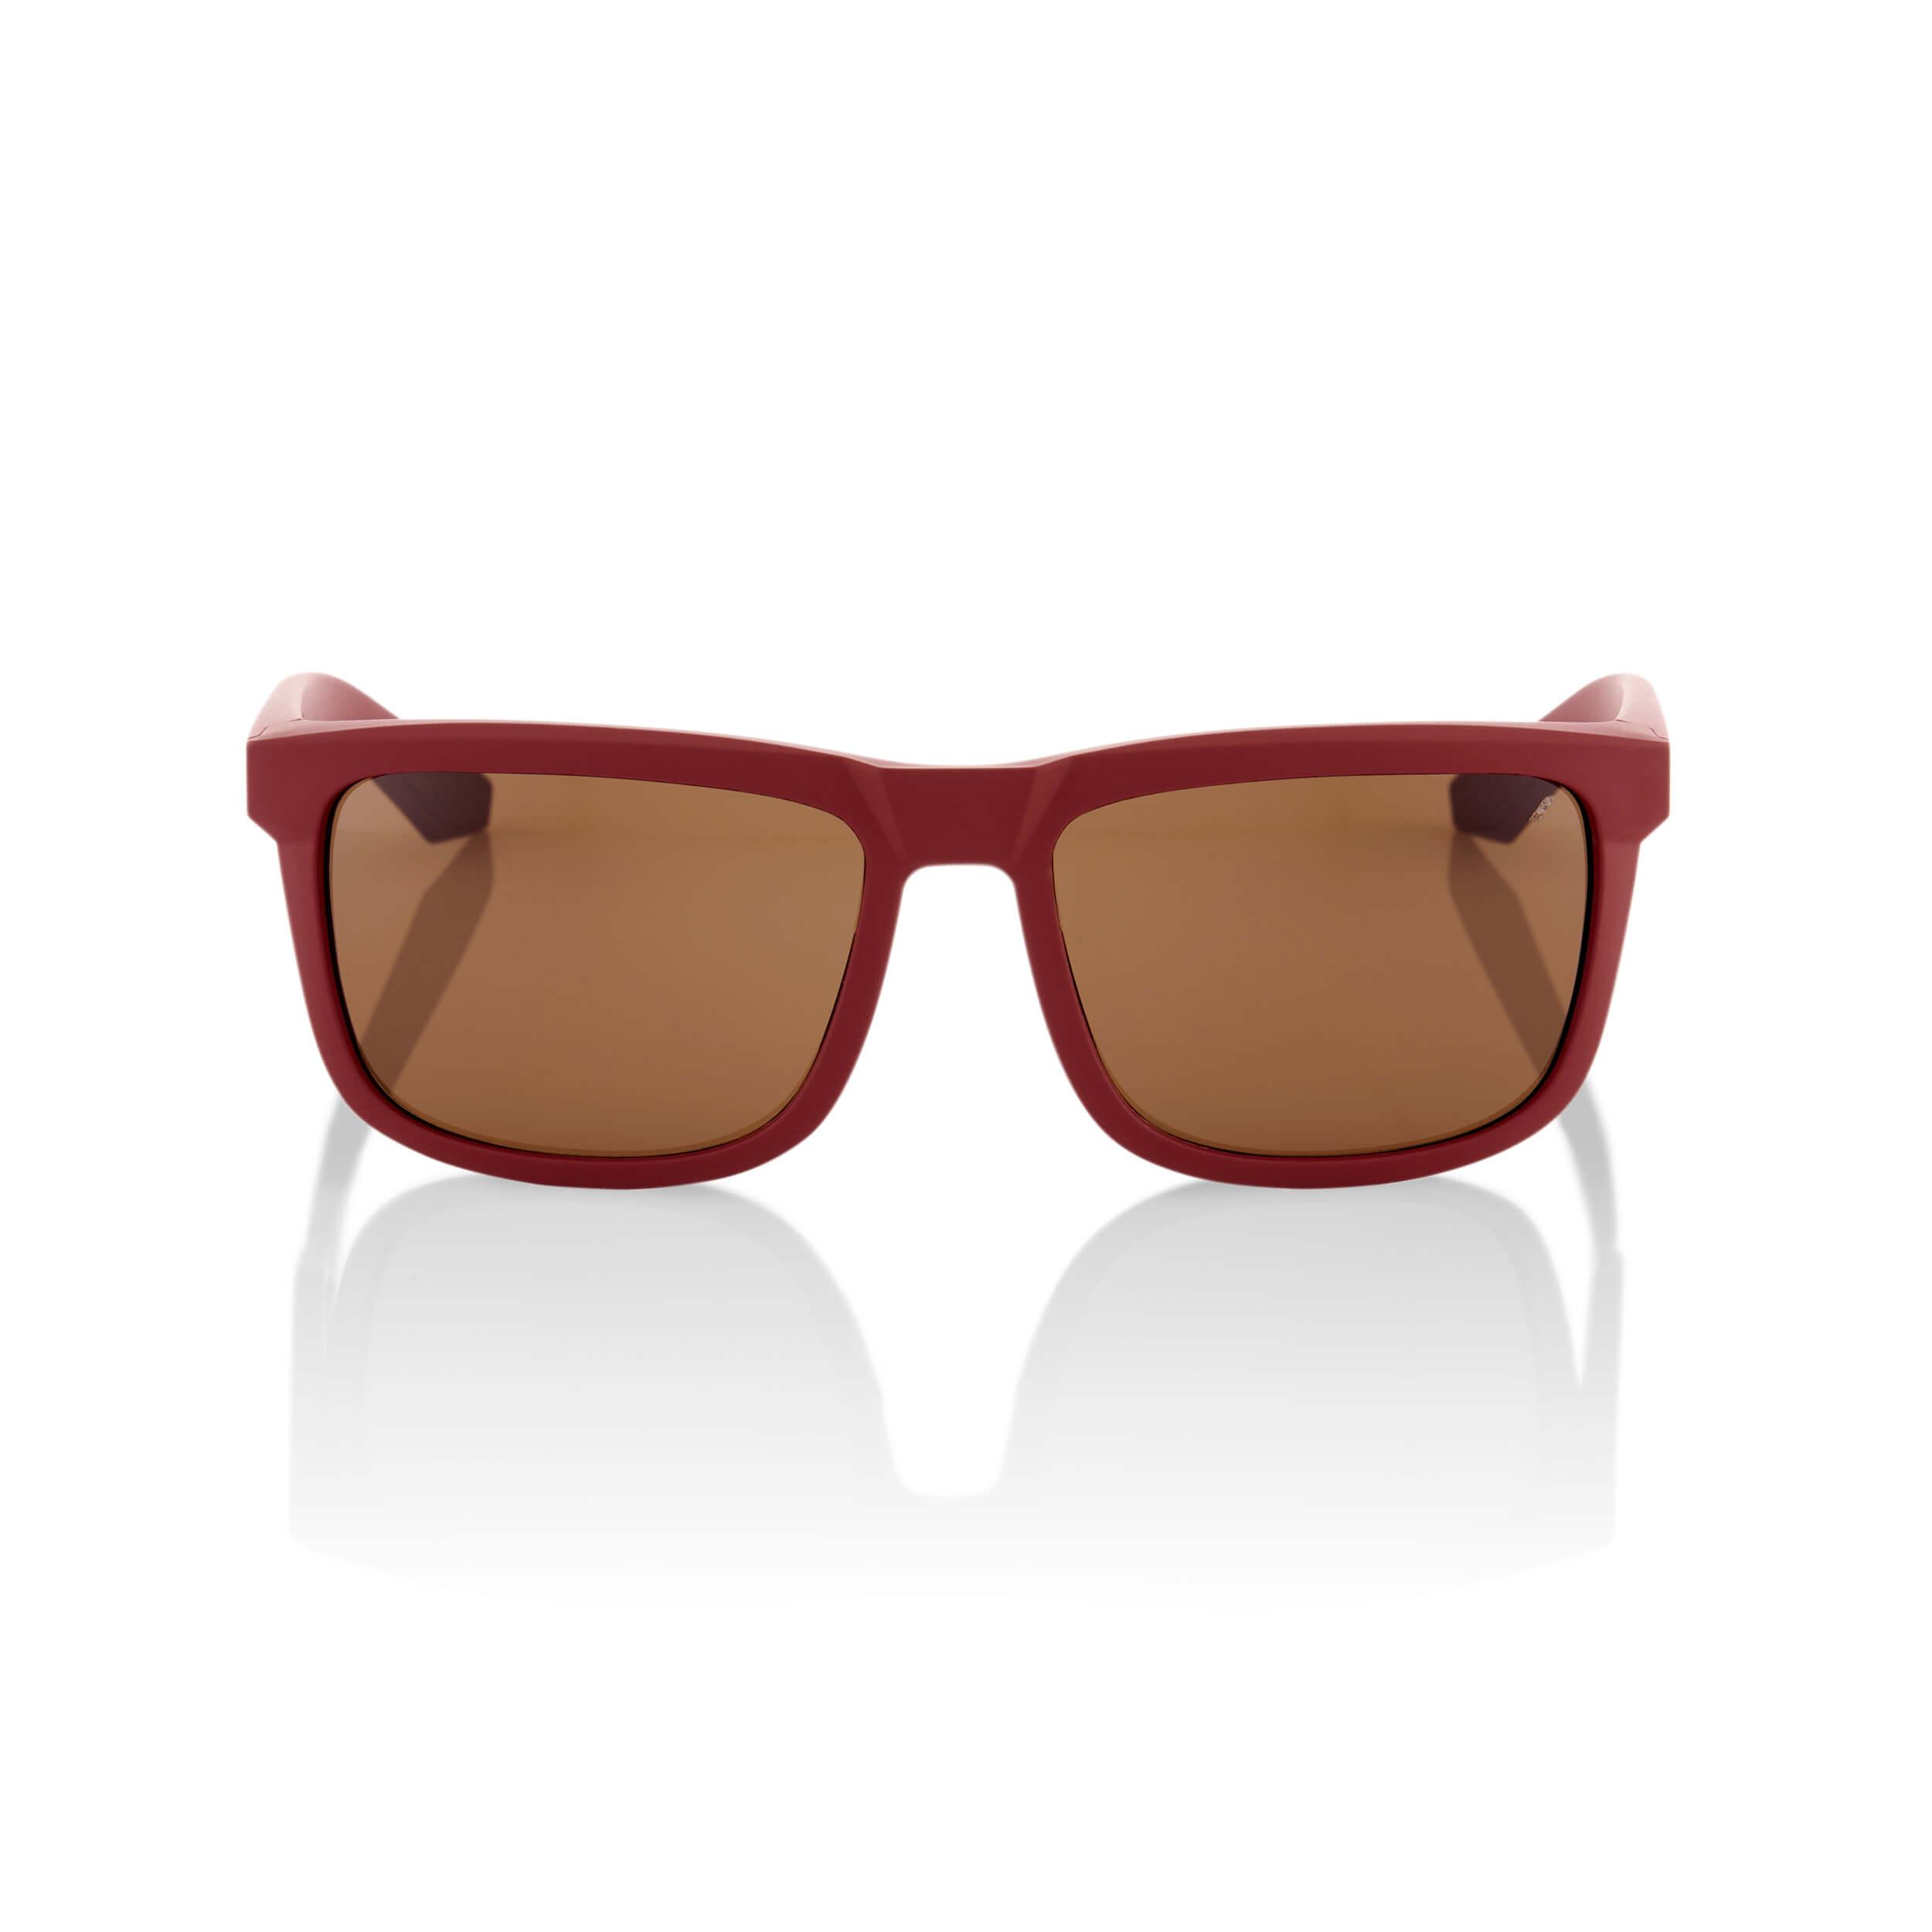 BLAKE – Soft Tact Crimson – Bronze Lens